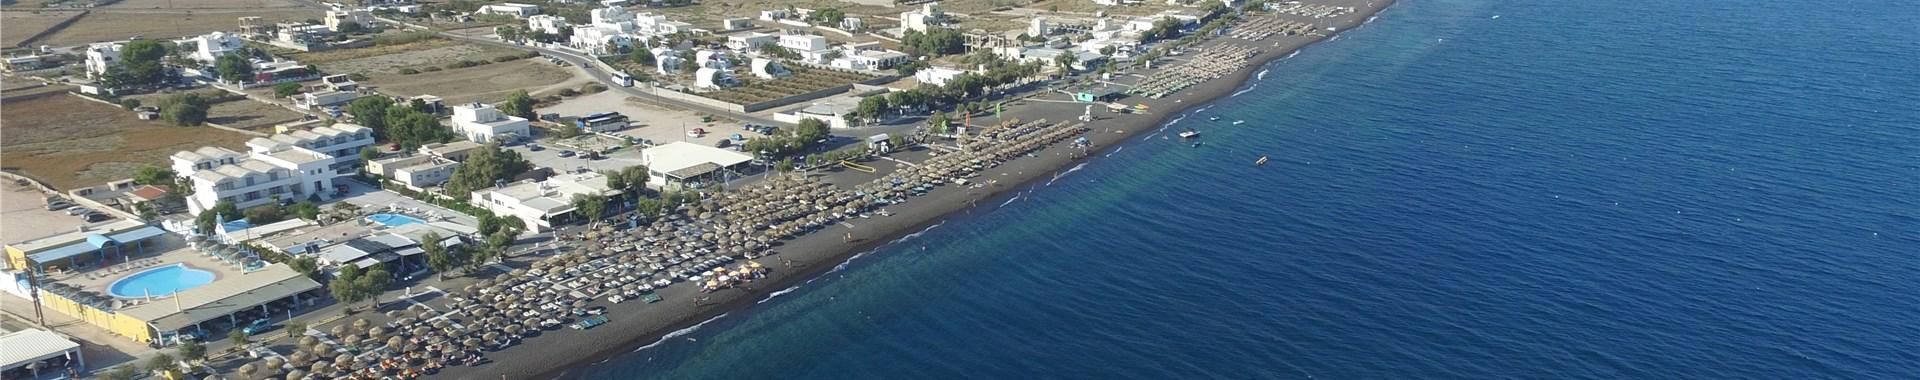 Perivolos Perivolos Hotels in Santorini island, Greece